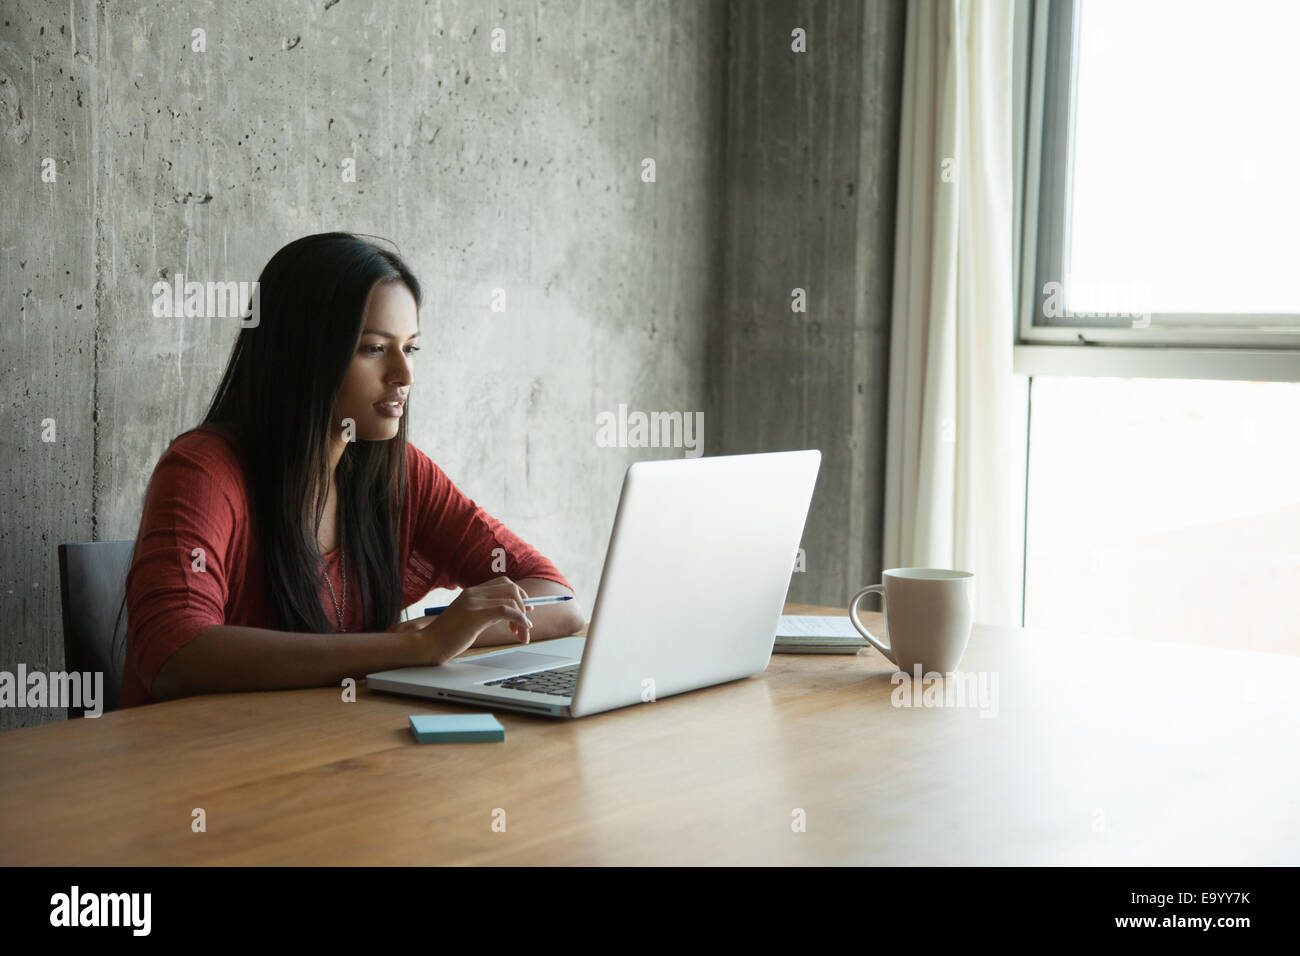 Frau mit Laptop zu Hause Stockbild